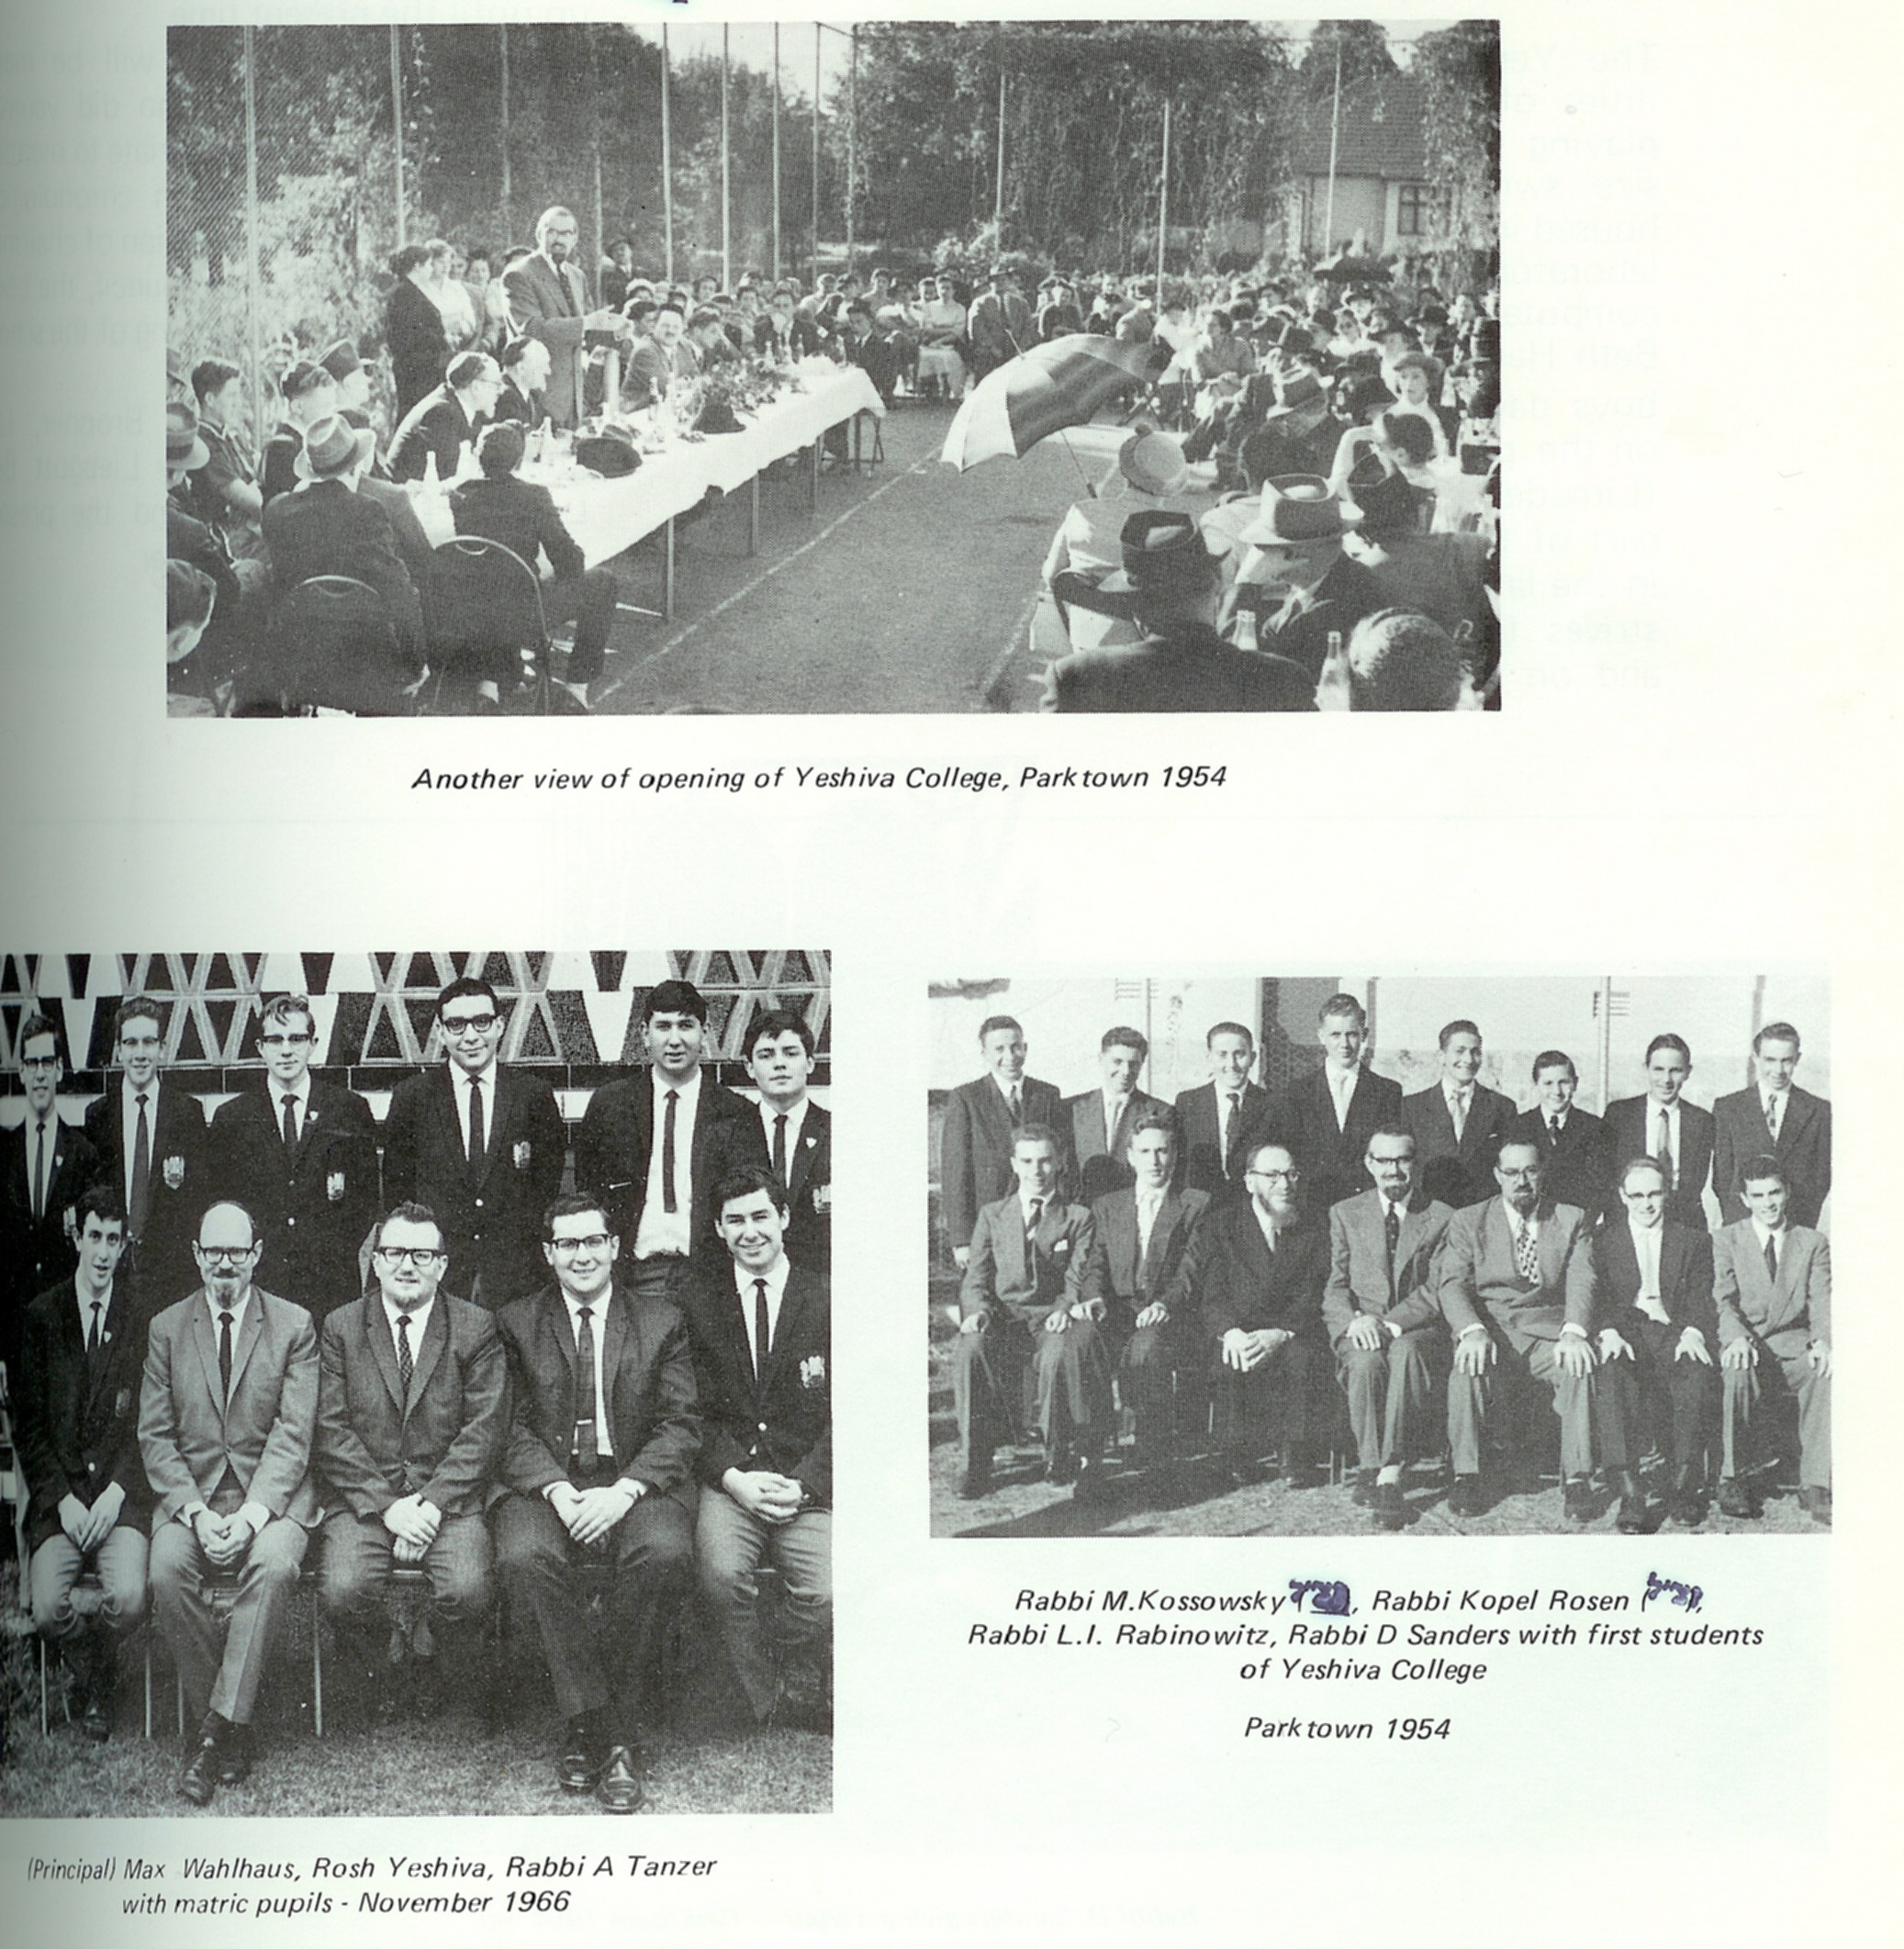 Opening Ceremony - Yeshiva College, Rabbis &Students